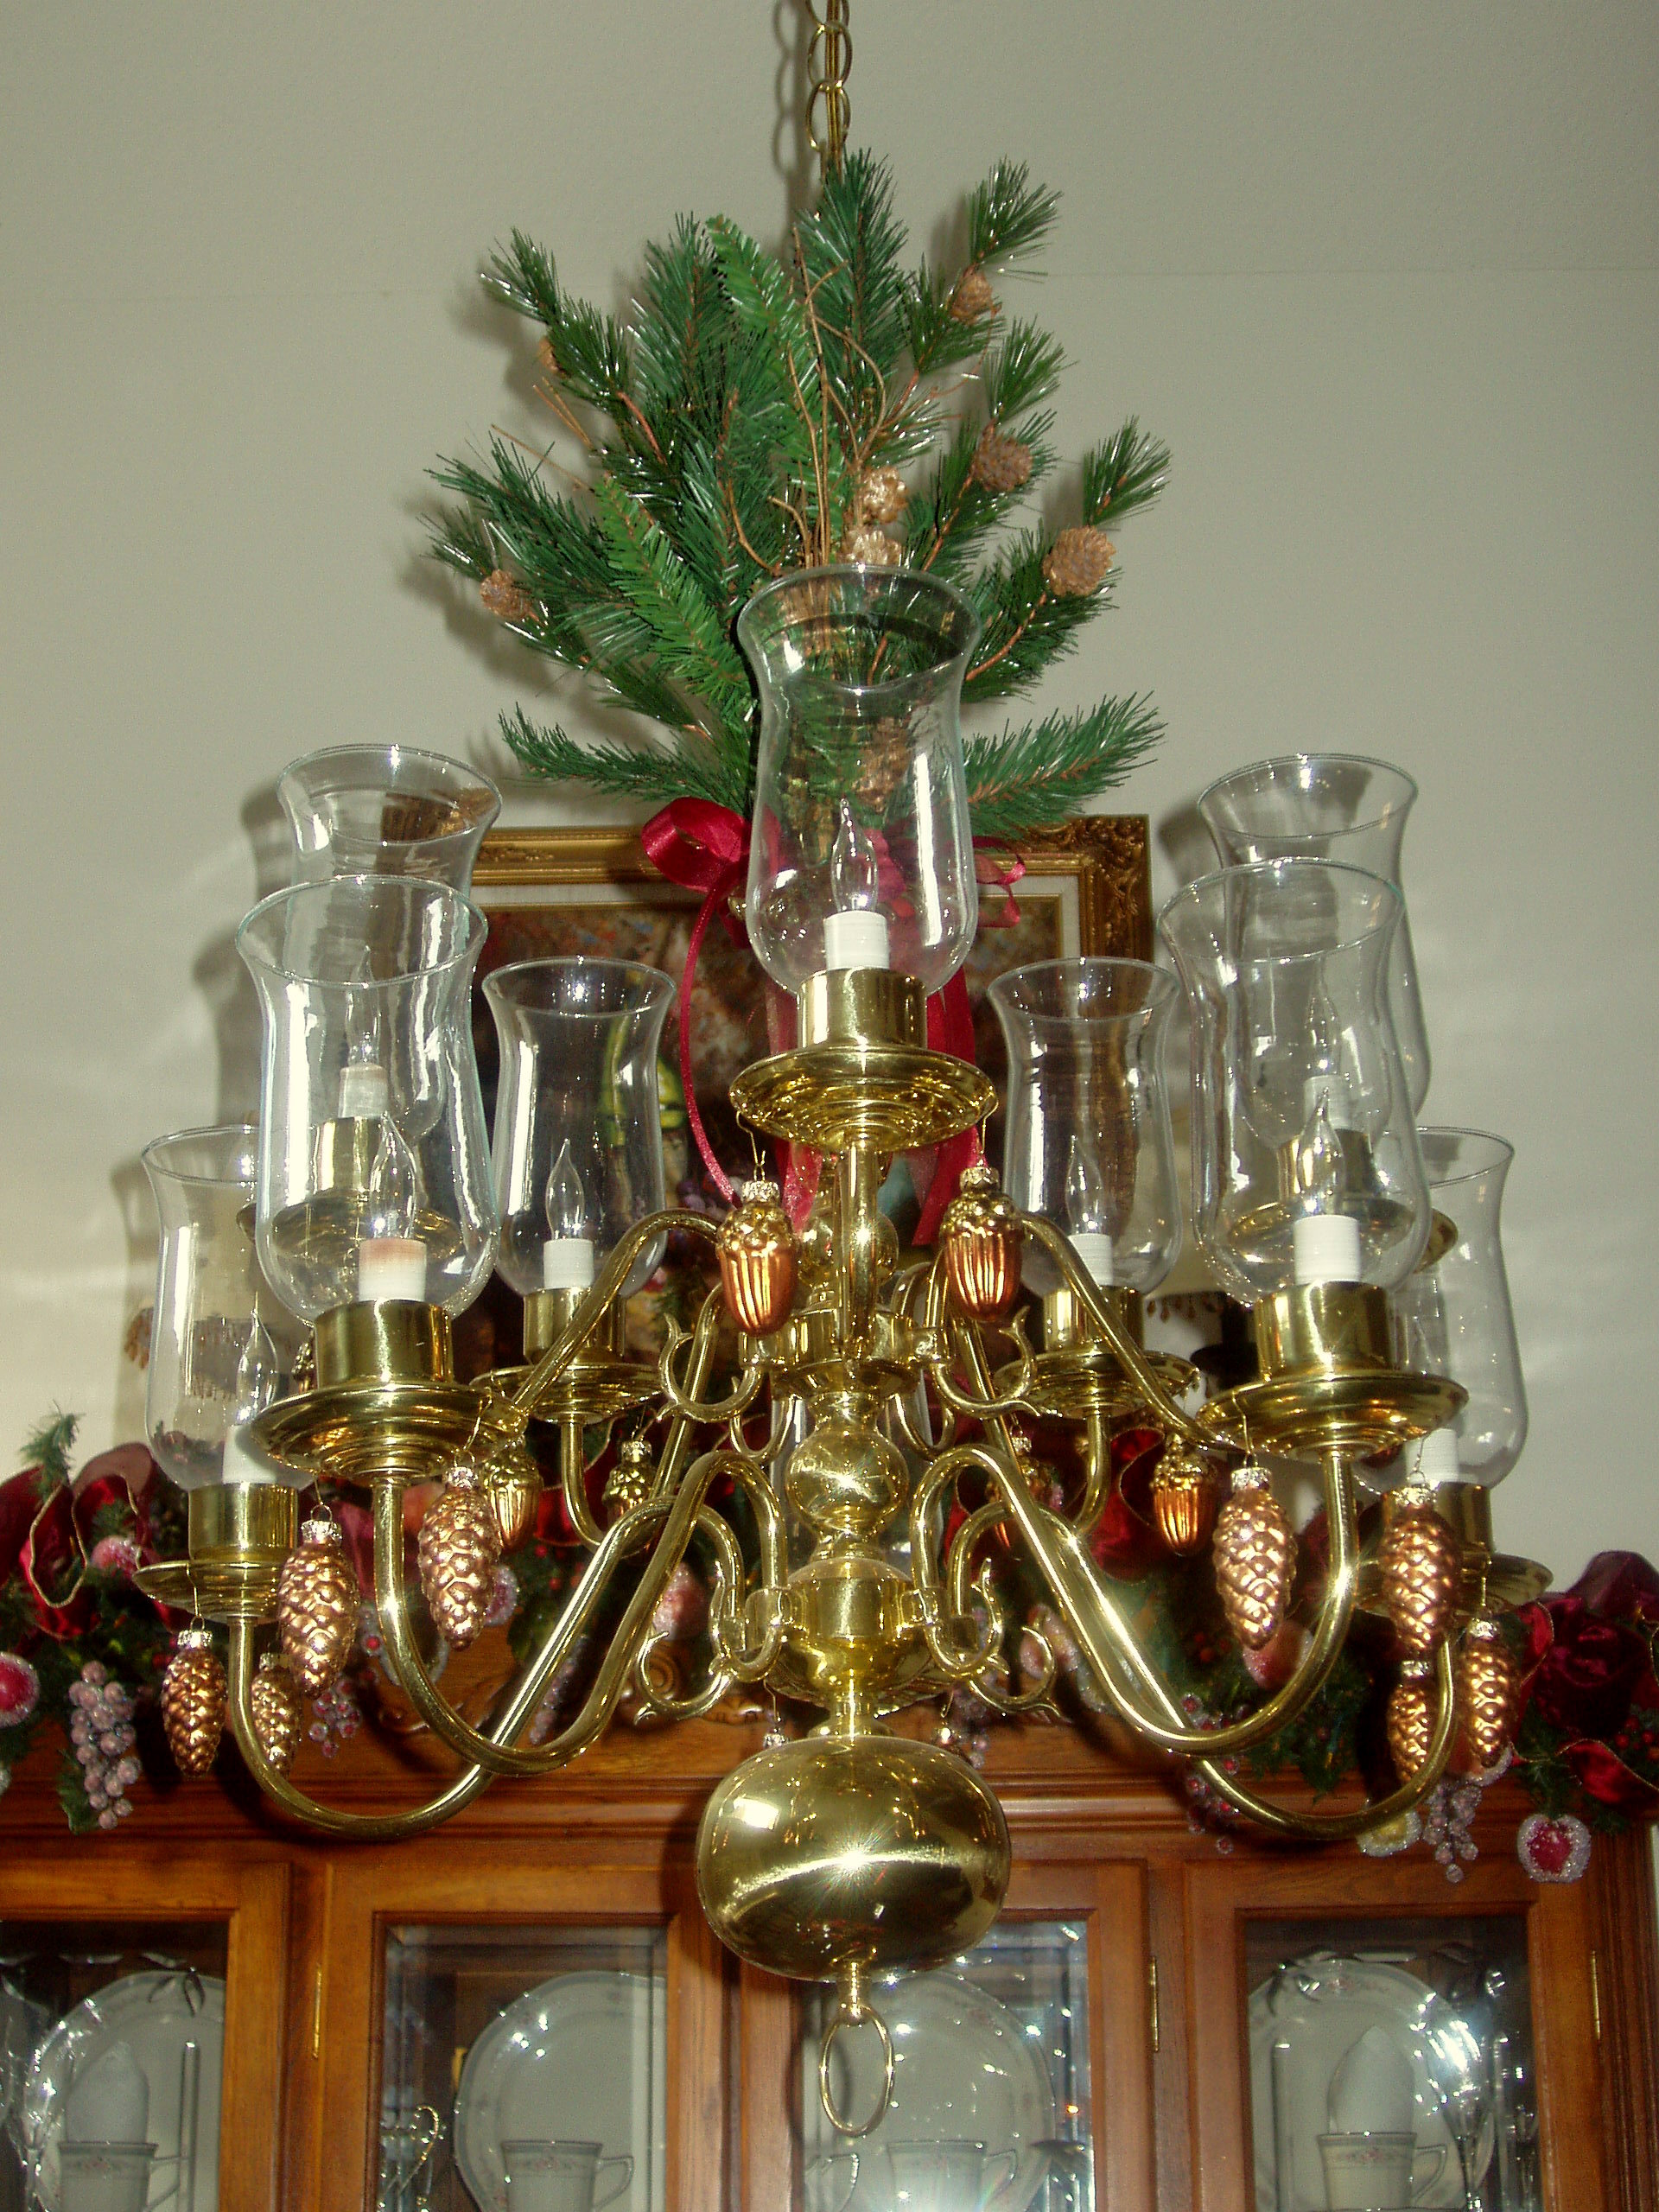 Camera christmas ornaments - Olympus Digital Camera